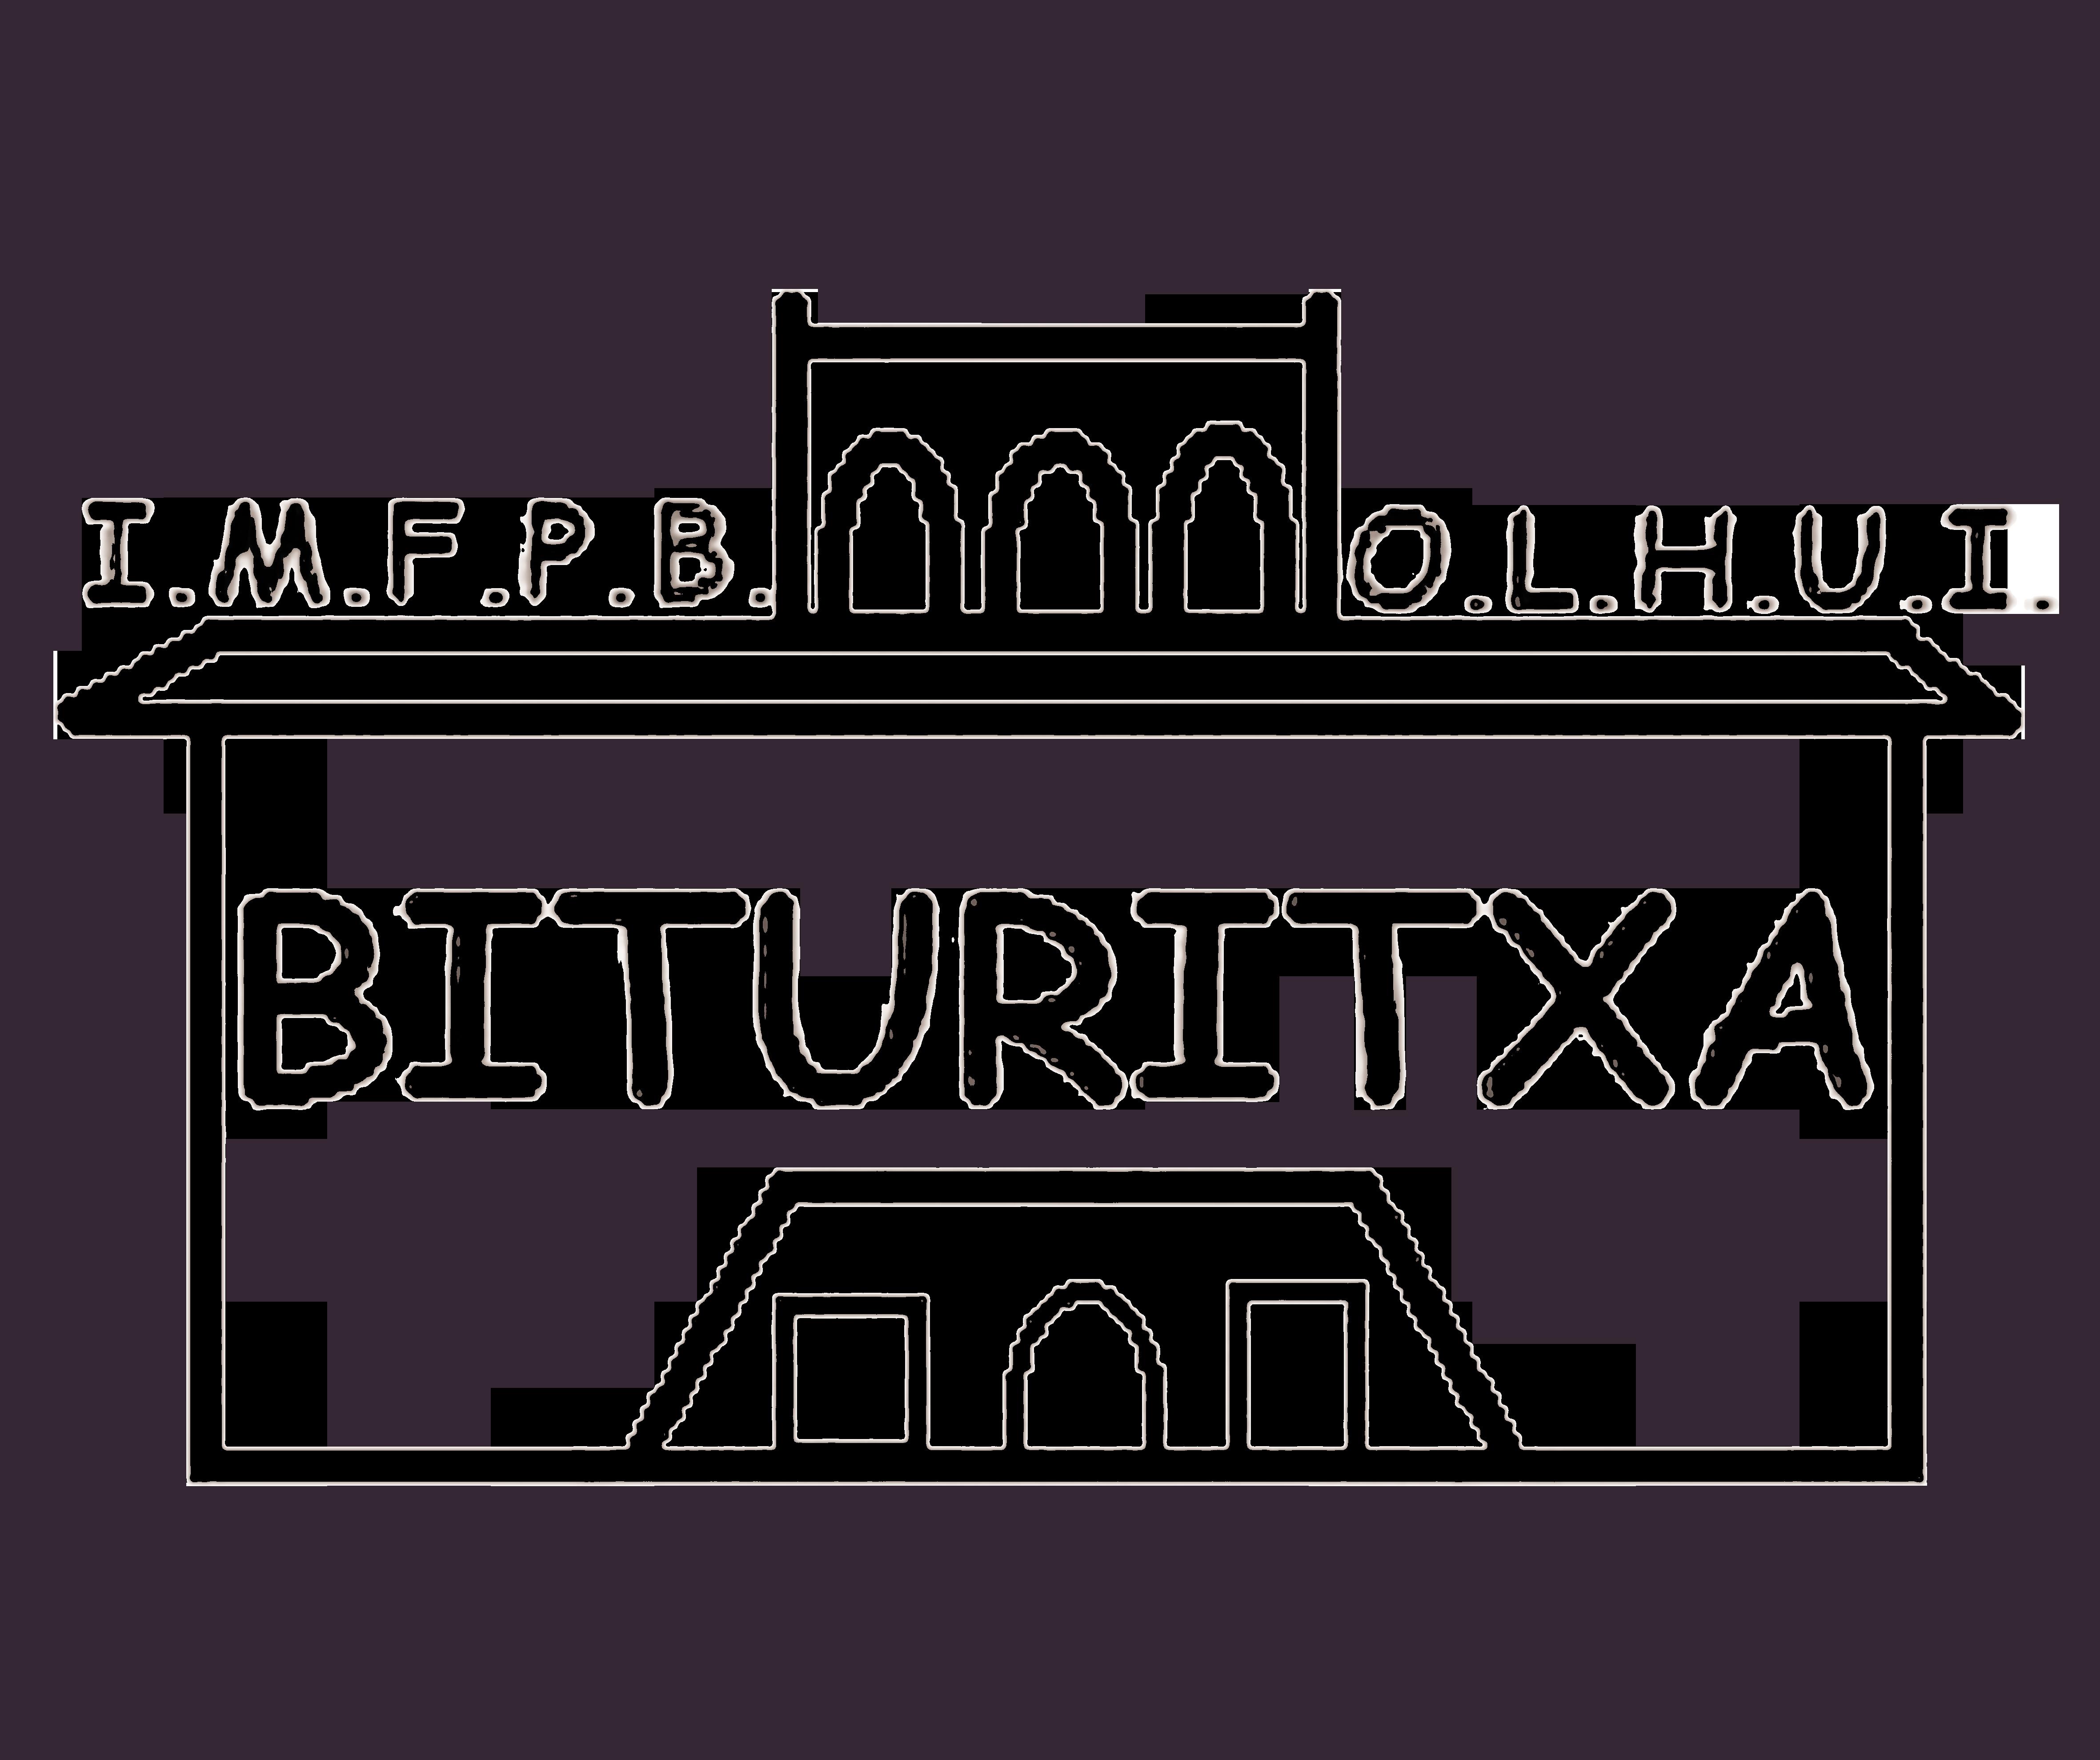 Bituritxa